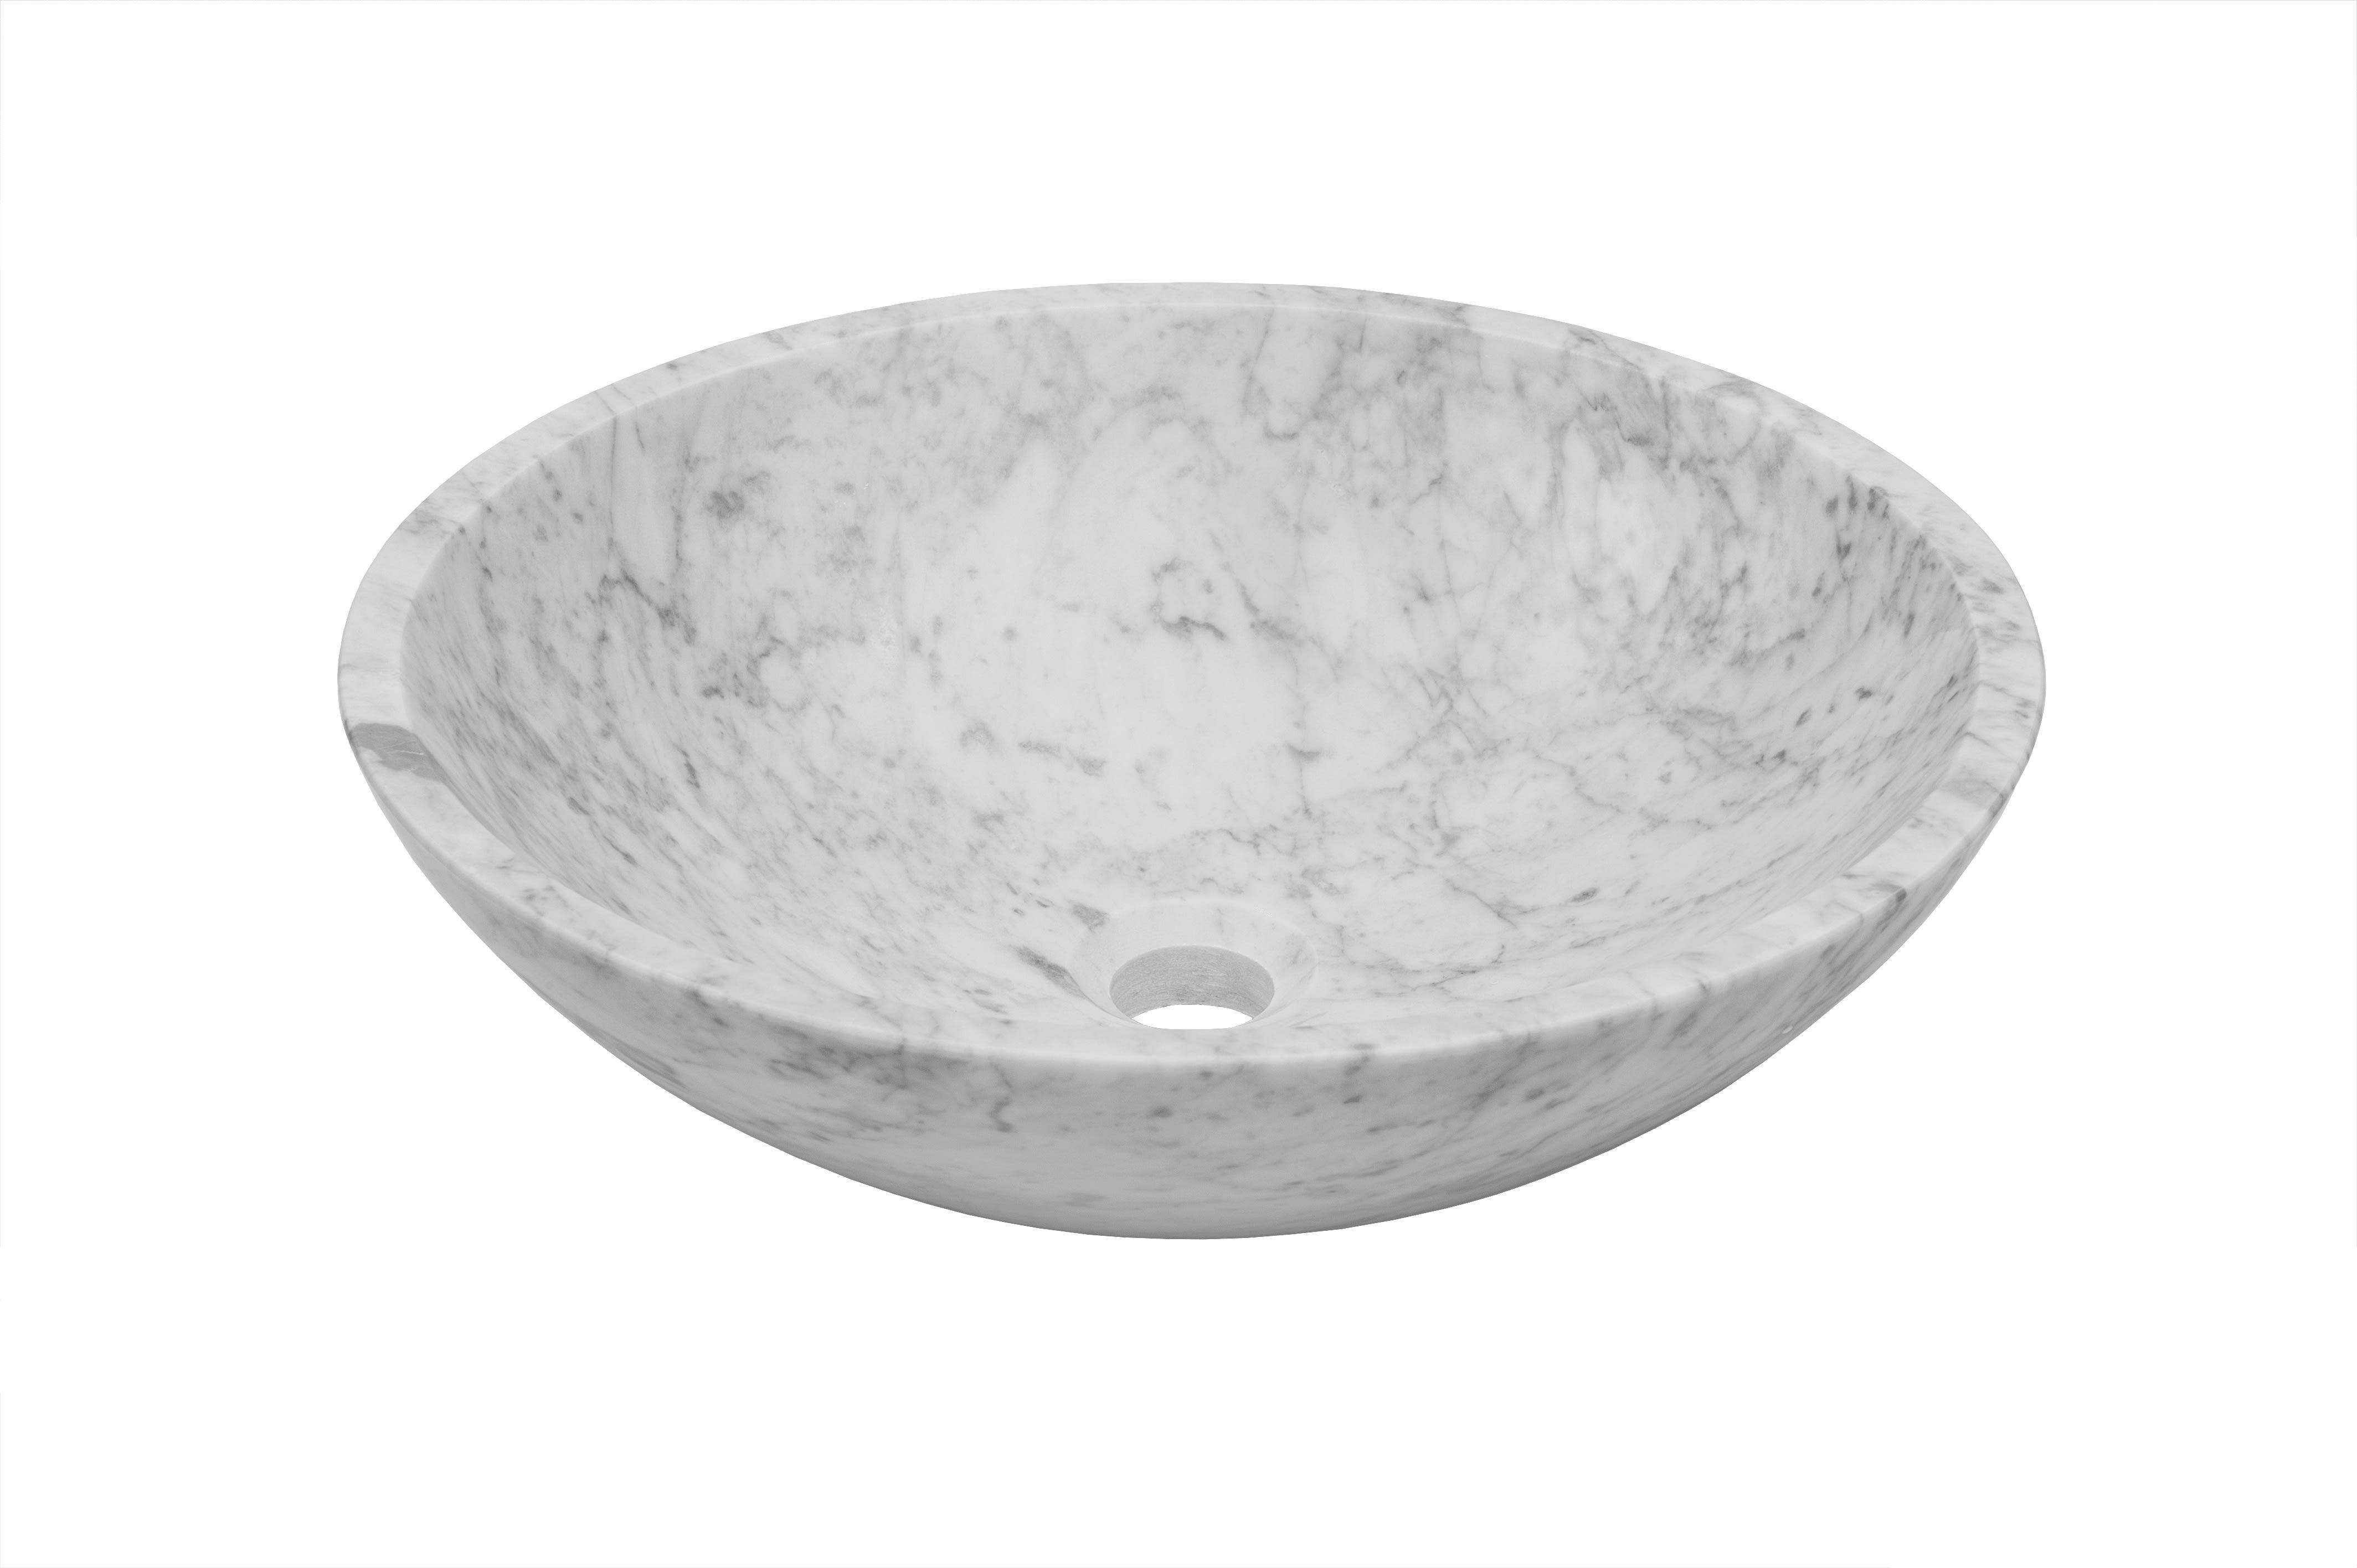 Miseno Mno Wc Bn Brushed Nickel Drain Circular 17 Carrera Marble Vessel Bathroom Sink Faucet Com